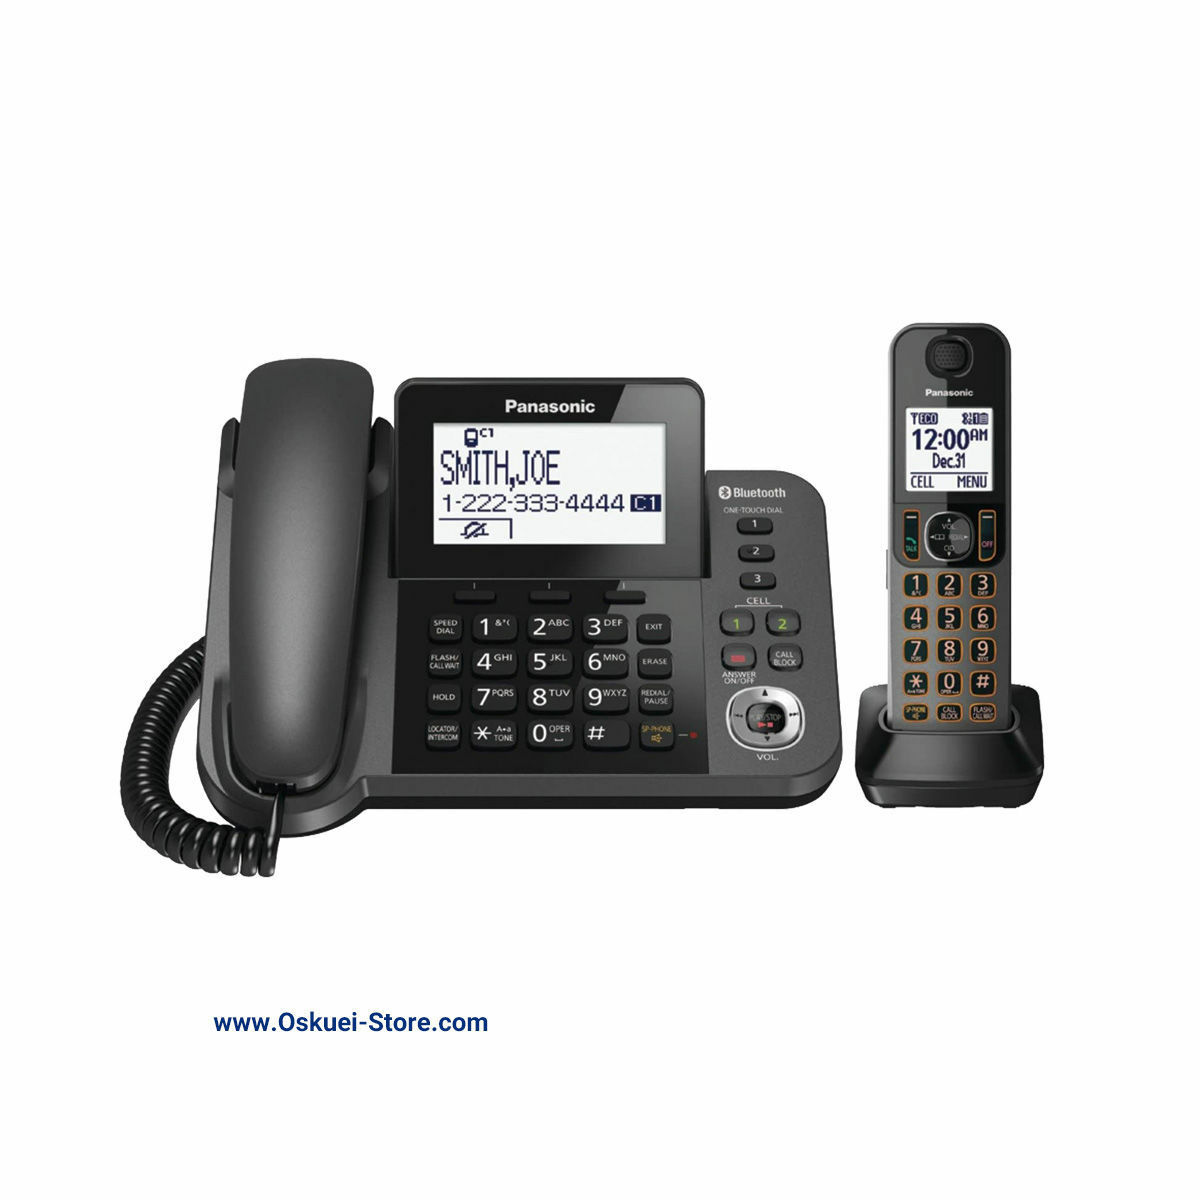 تلفن بي سيم پاناسونيک مدل KX-TGF380